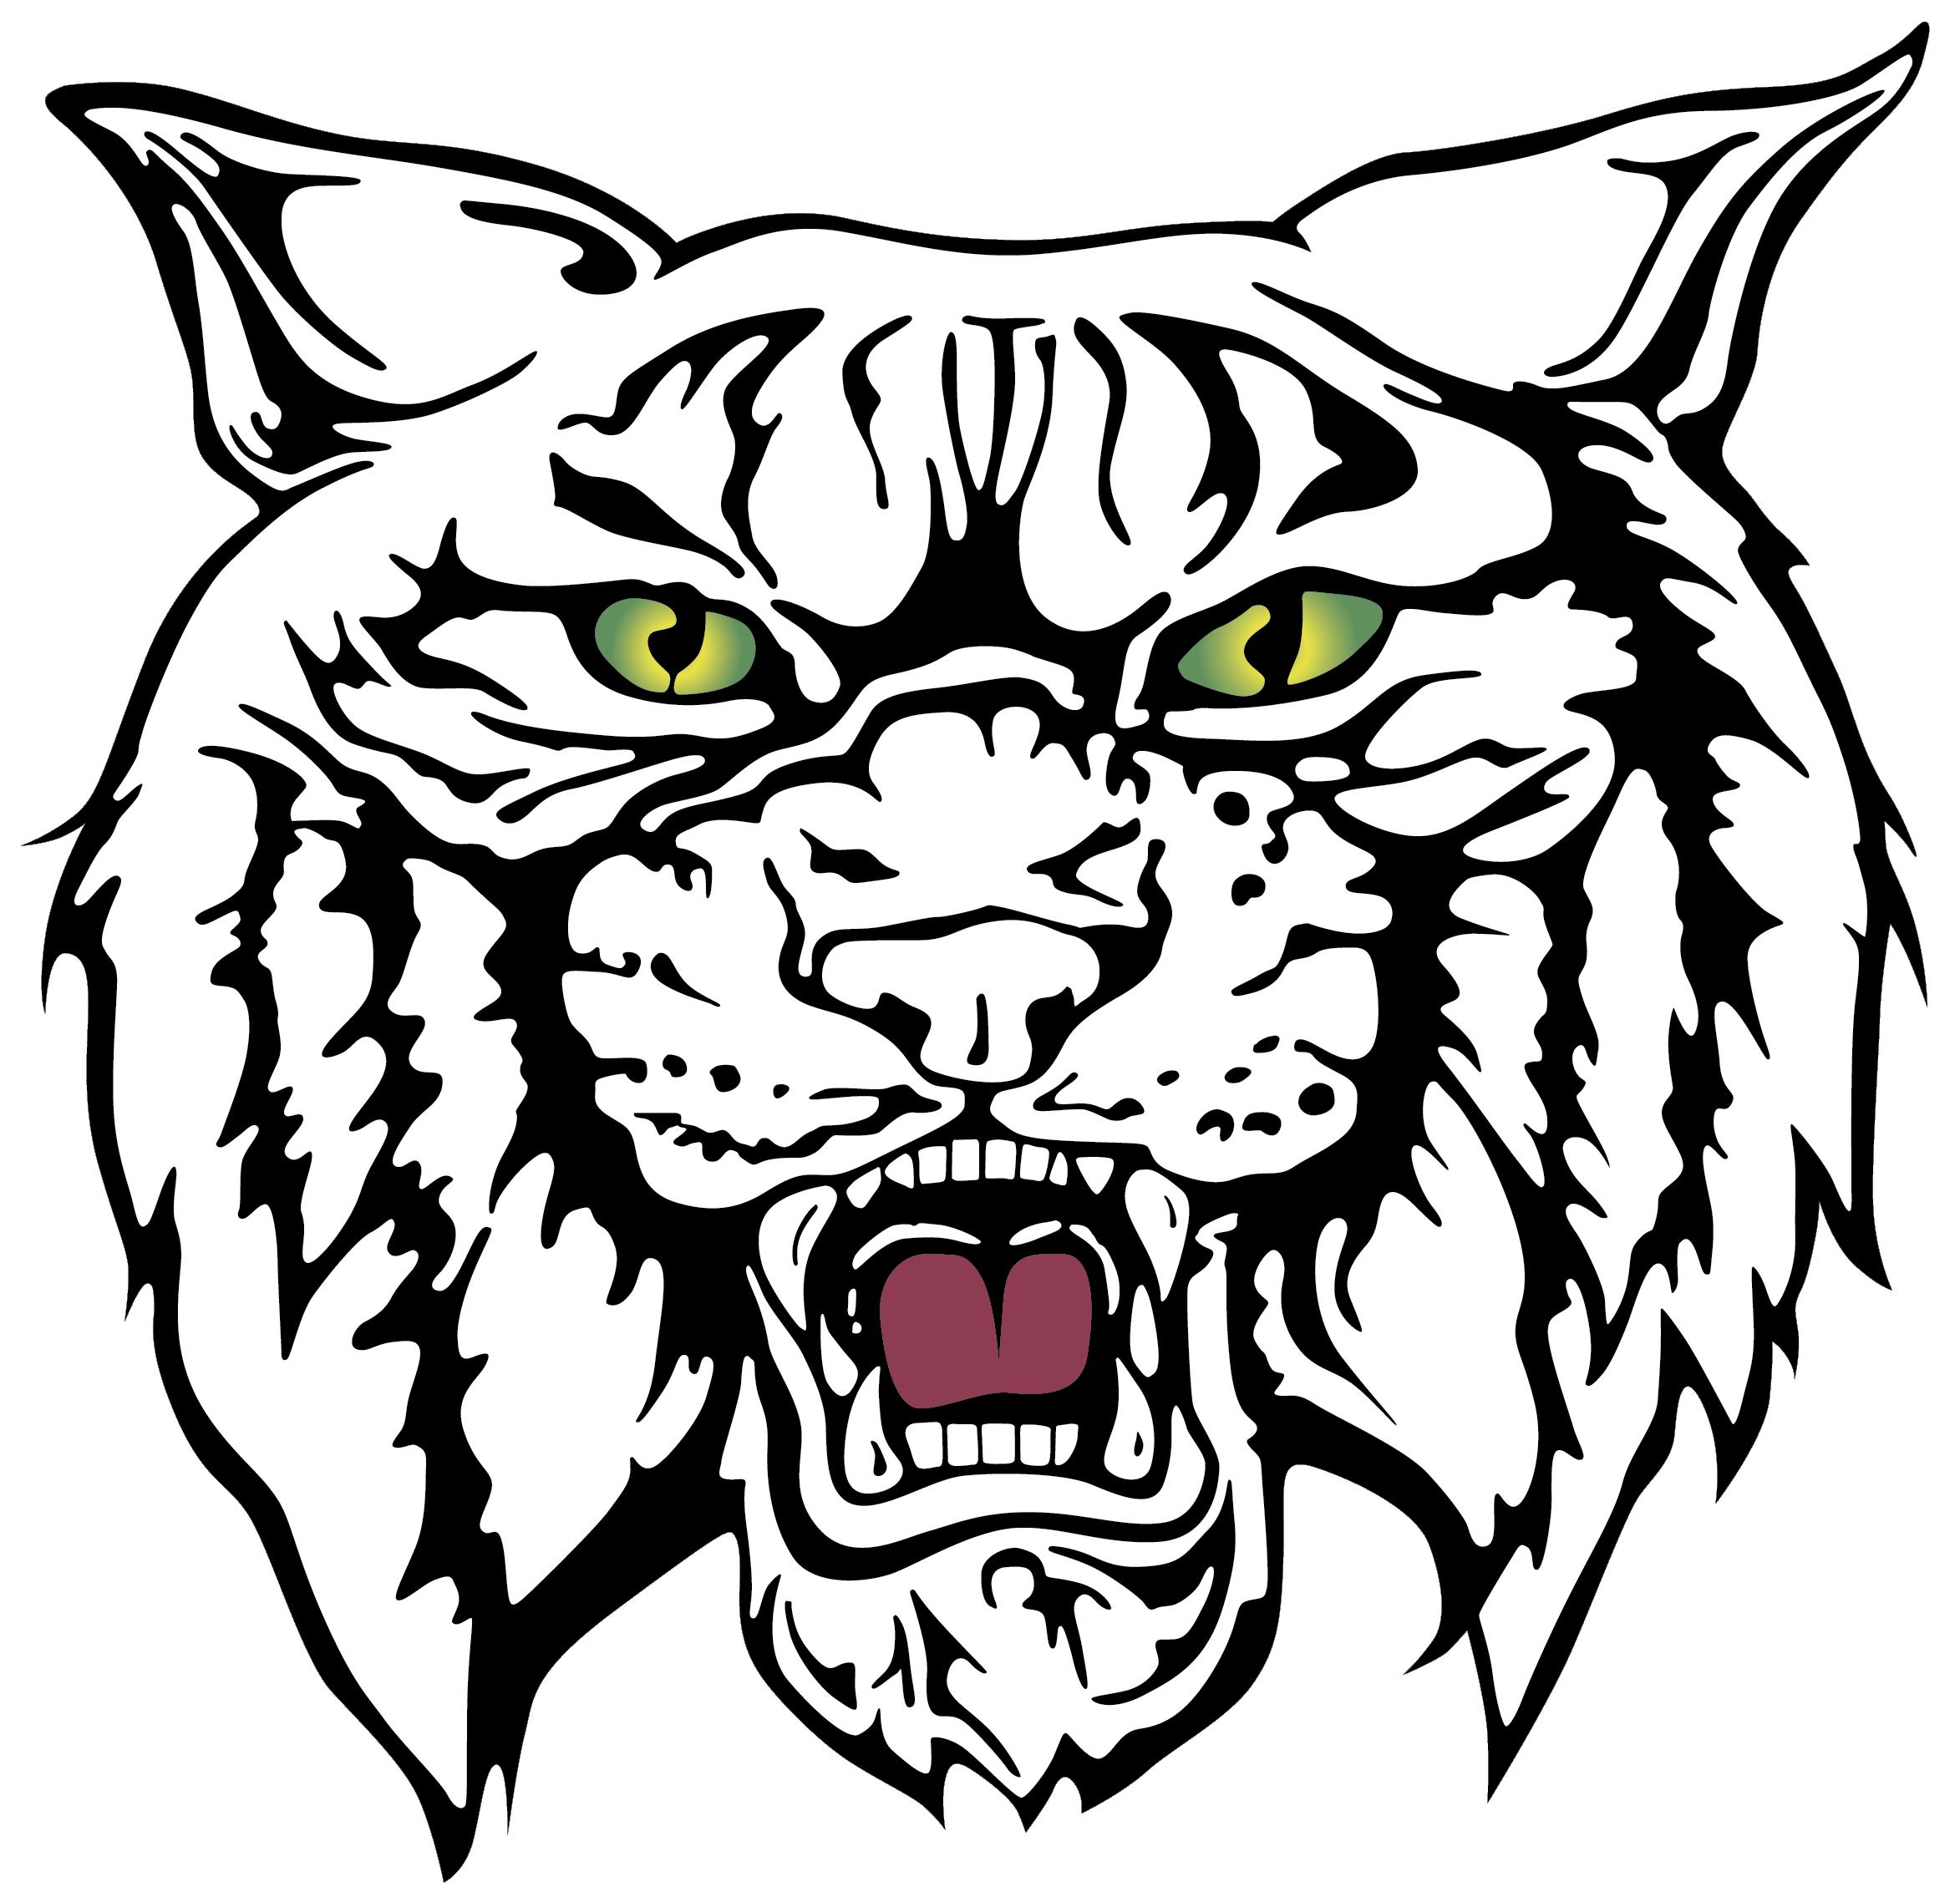 Wildcat school mascot clipart clipart freeuse download Wildcat Mascot Clipart (58+) clipart freeuse download